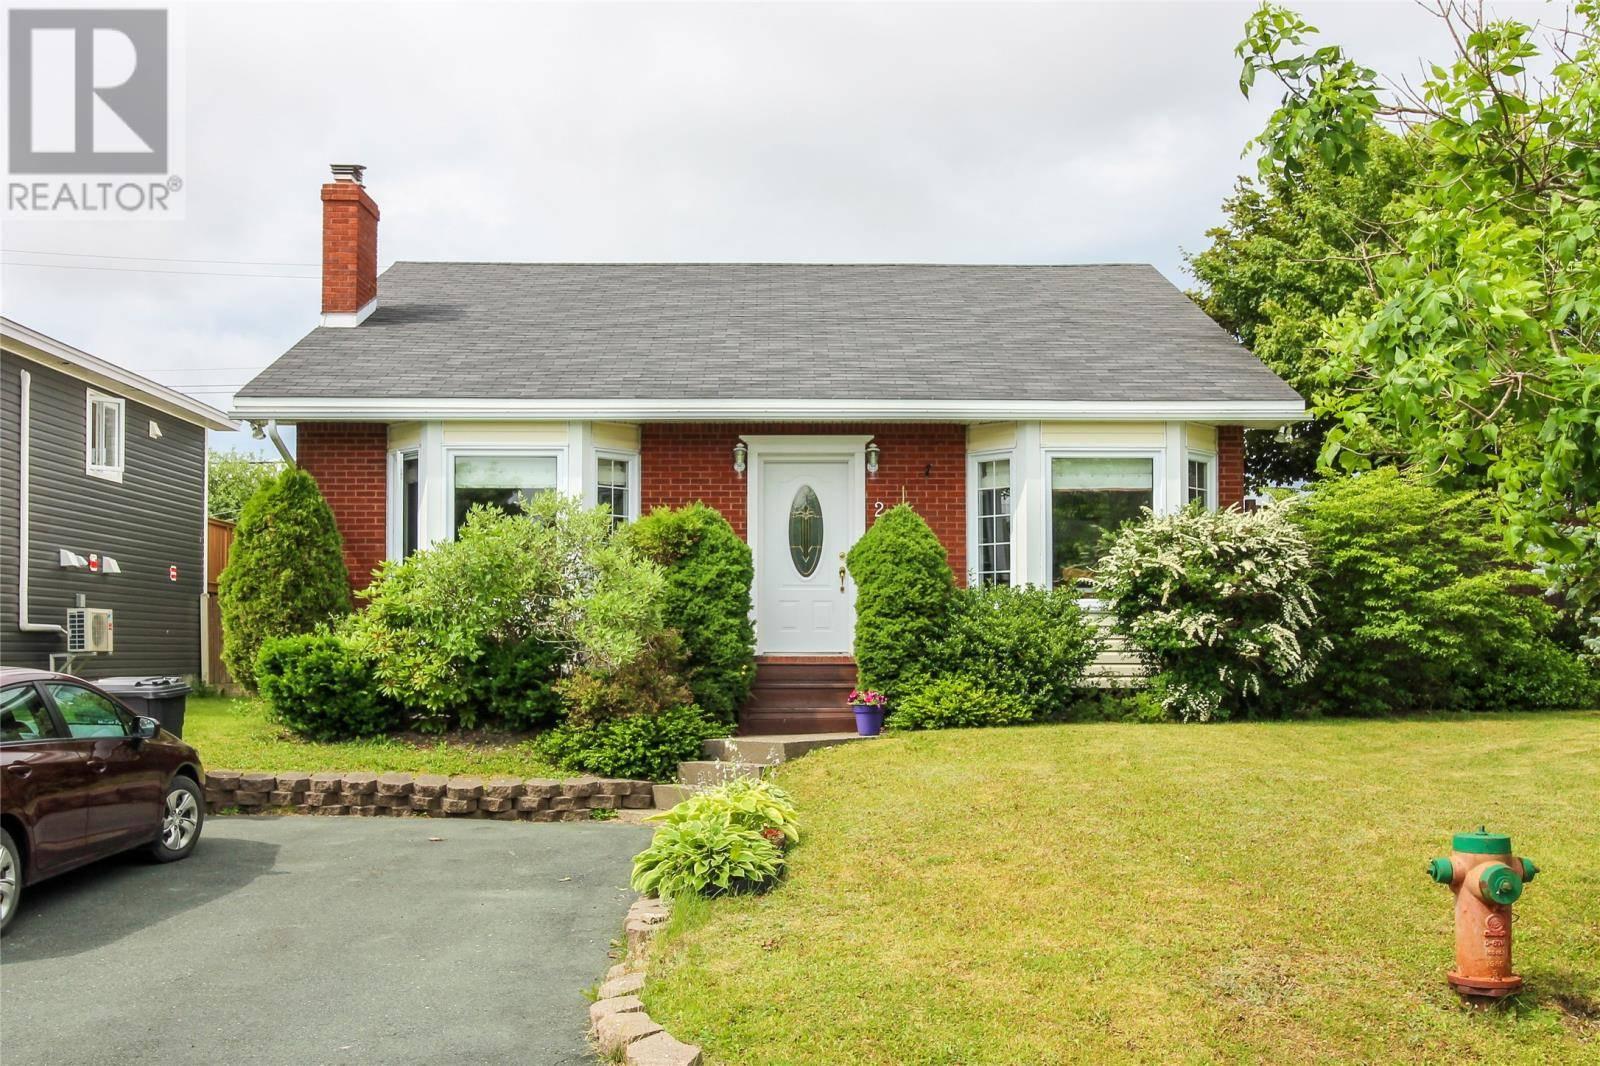 House for sale at 2 Samson St Mount Pearl Newfoundland - MLS: 1200565